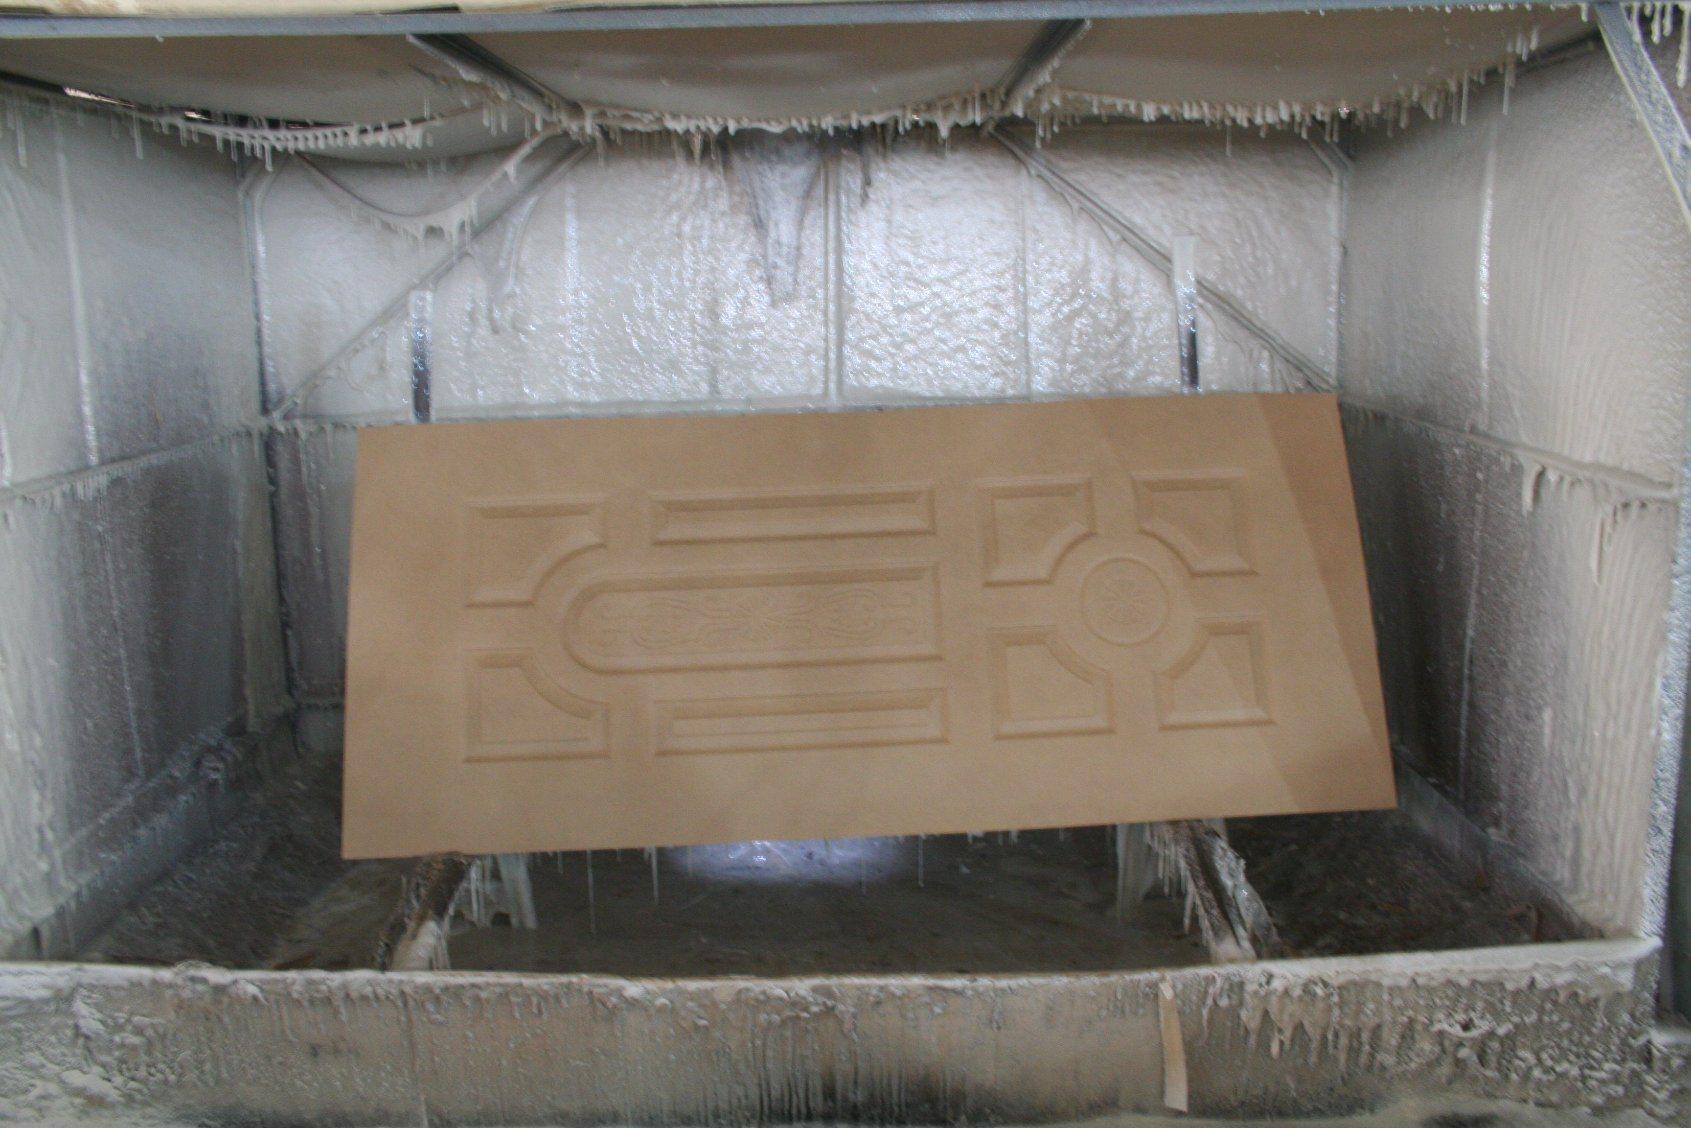 Door Skin for Middle East Market